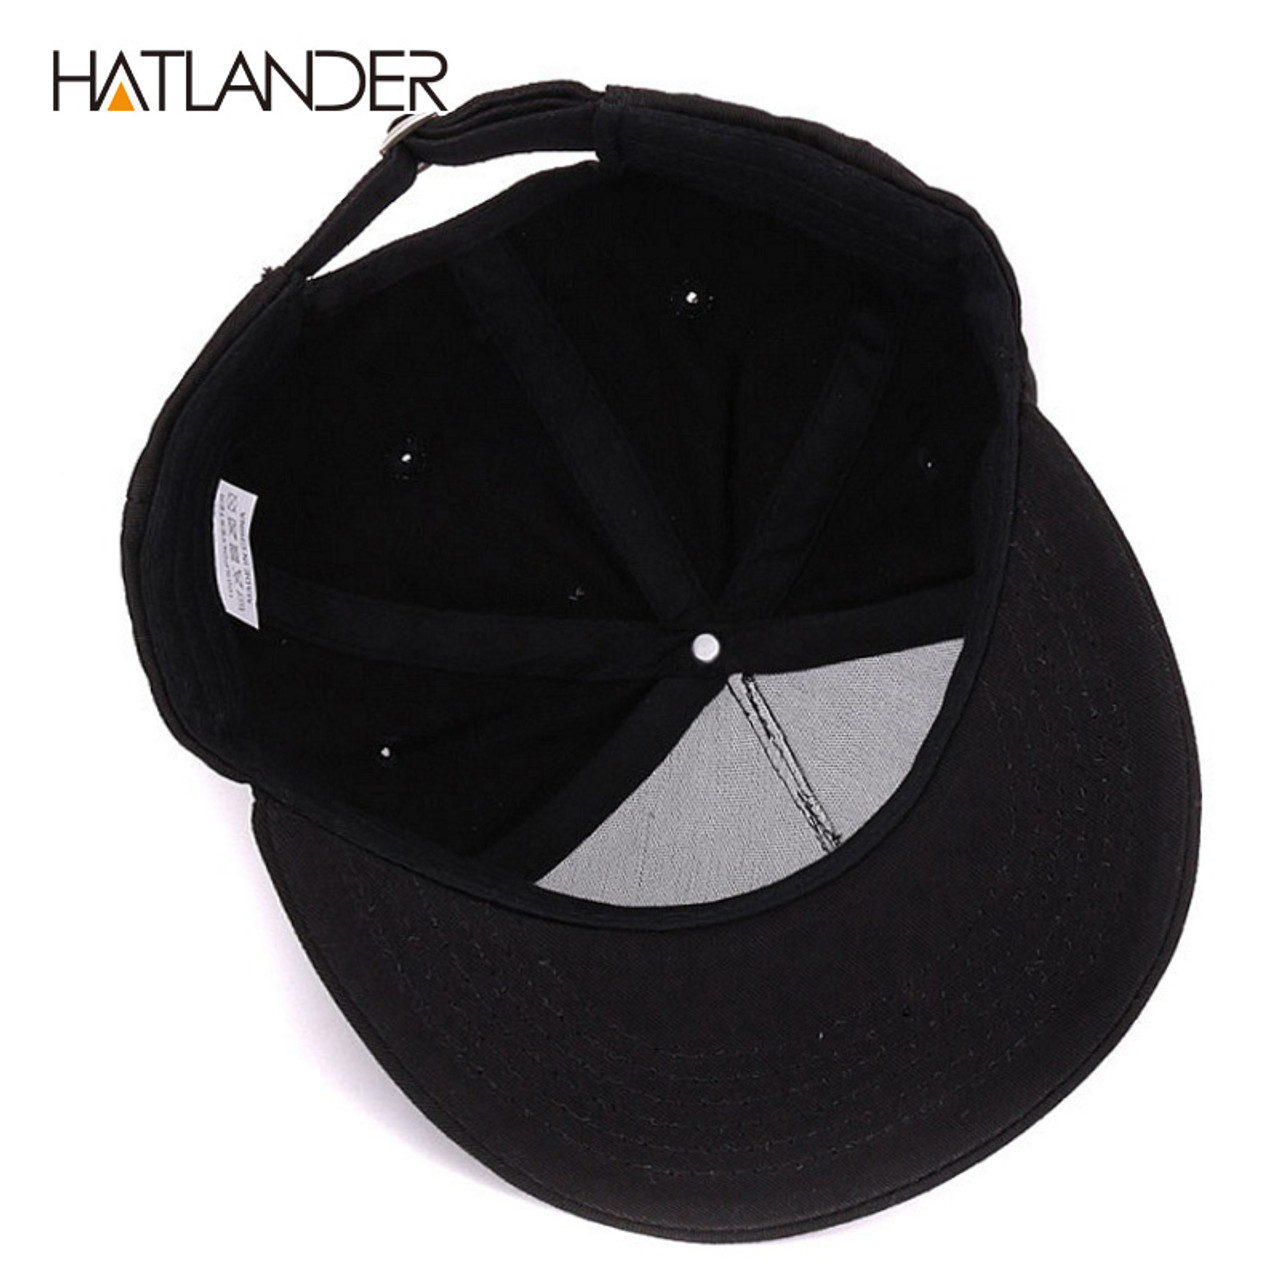 dc16cb314d7 ...  HATLANDER Solid Letter cotton baseball caps for men women outdoor  sports hats 5panel hip ...